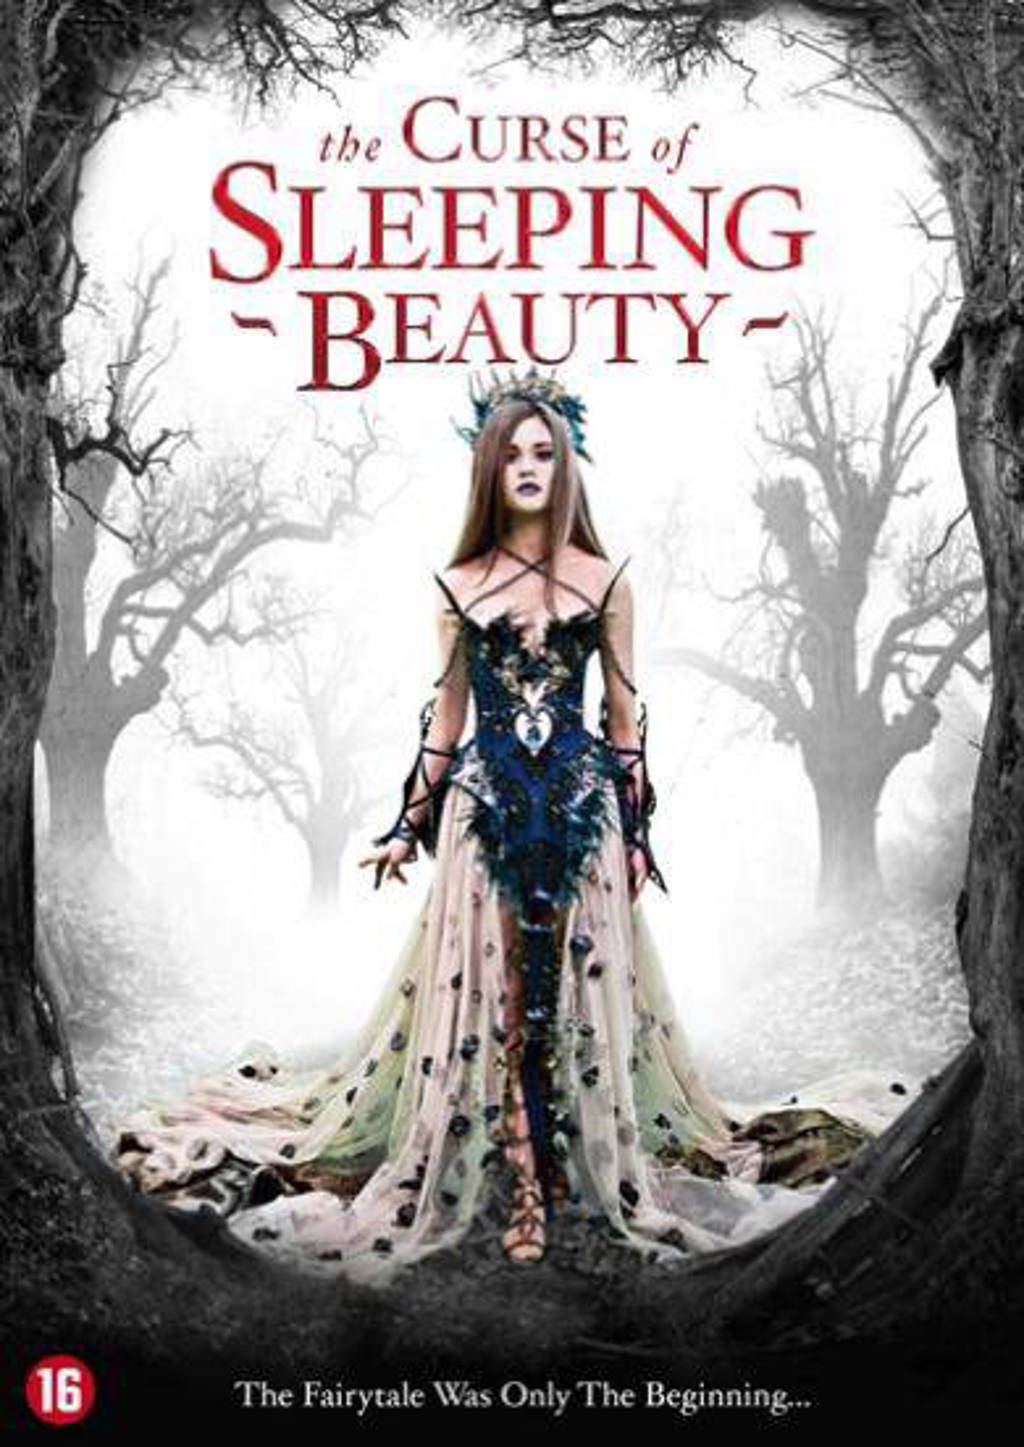 Curse of sleeping beauty (DVD)